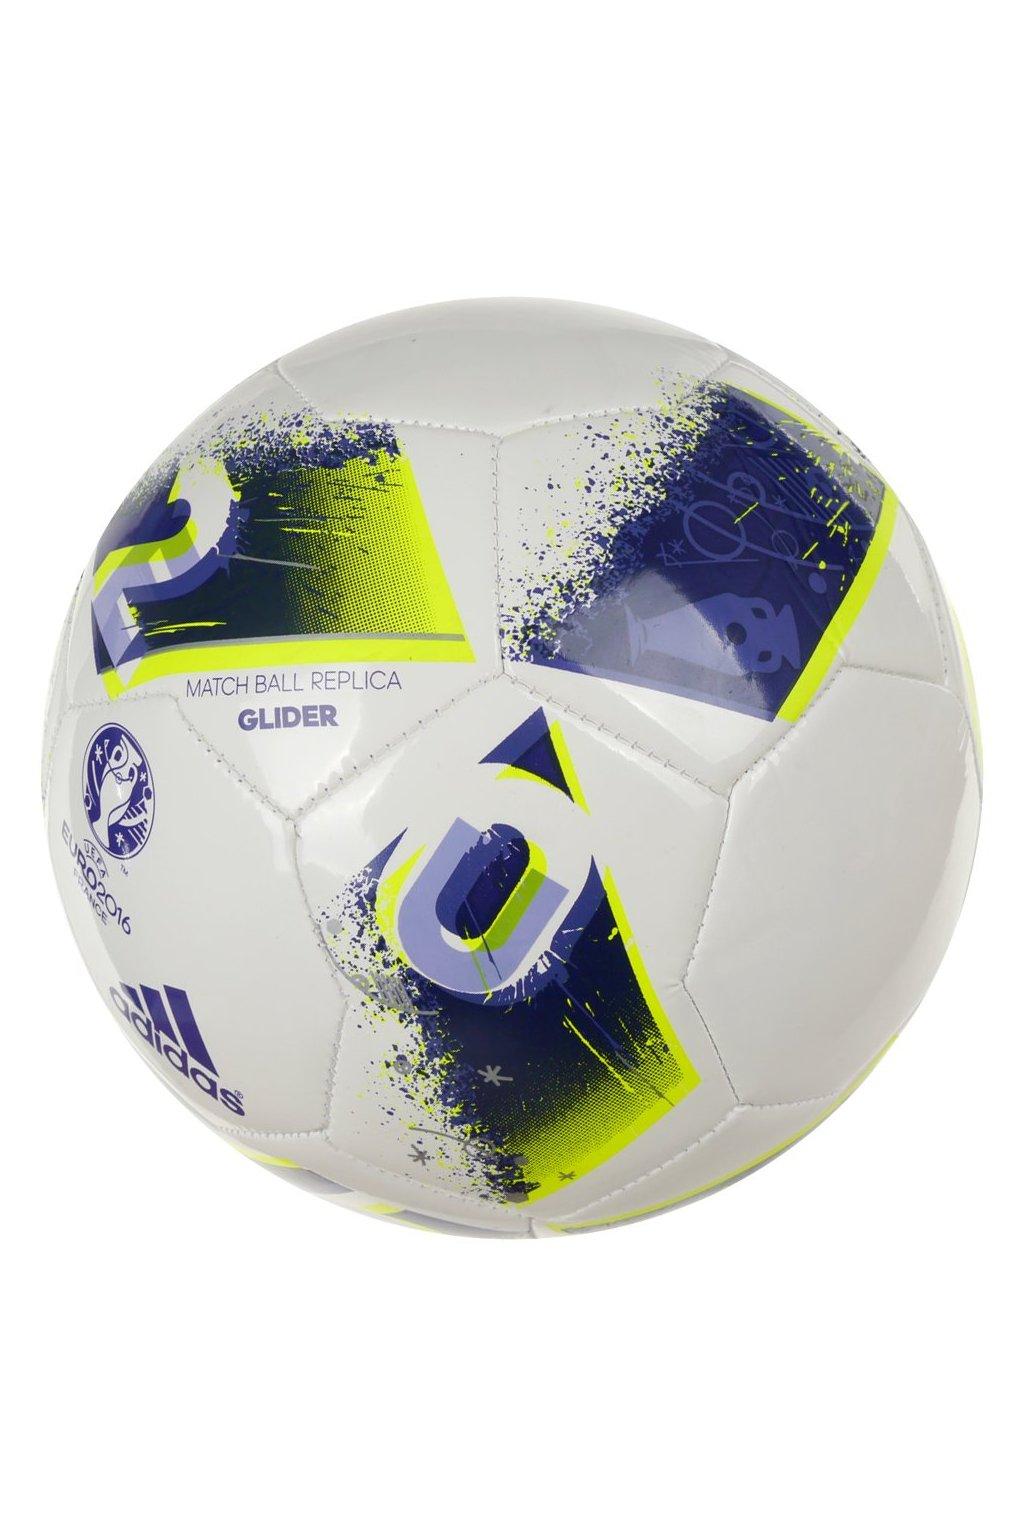 d8d2cc90cd82c pol pl Pilka nozna Adidas UEFA Euro 2016 Fracas Match Ball na orlik 11692 2 ADIDAS  EURO 2016 FRANCE GLIDER, futbalová lopta ...